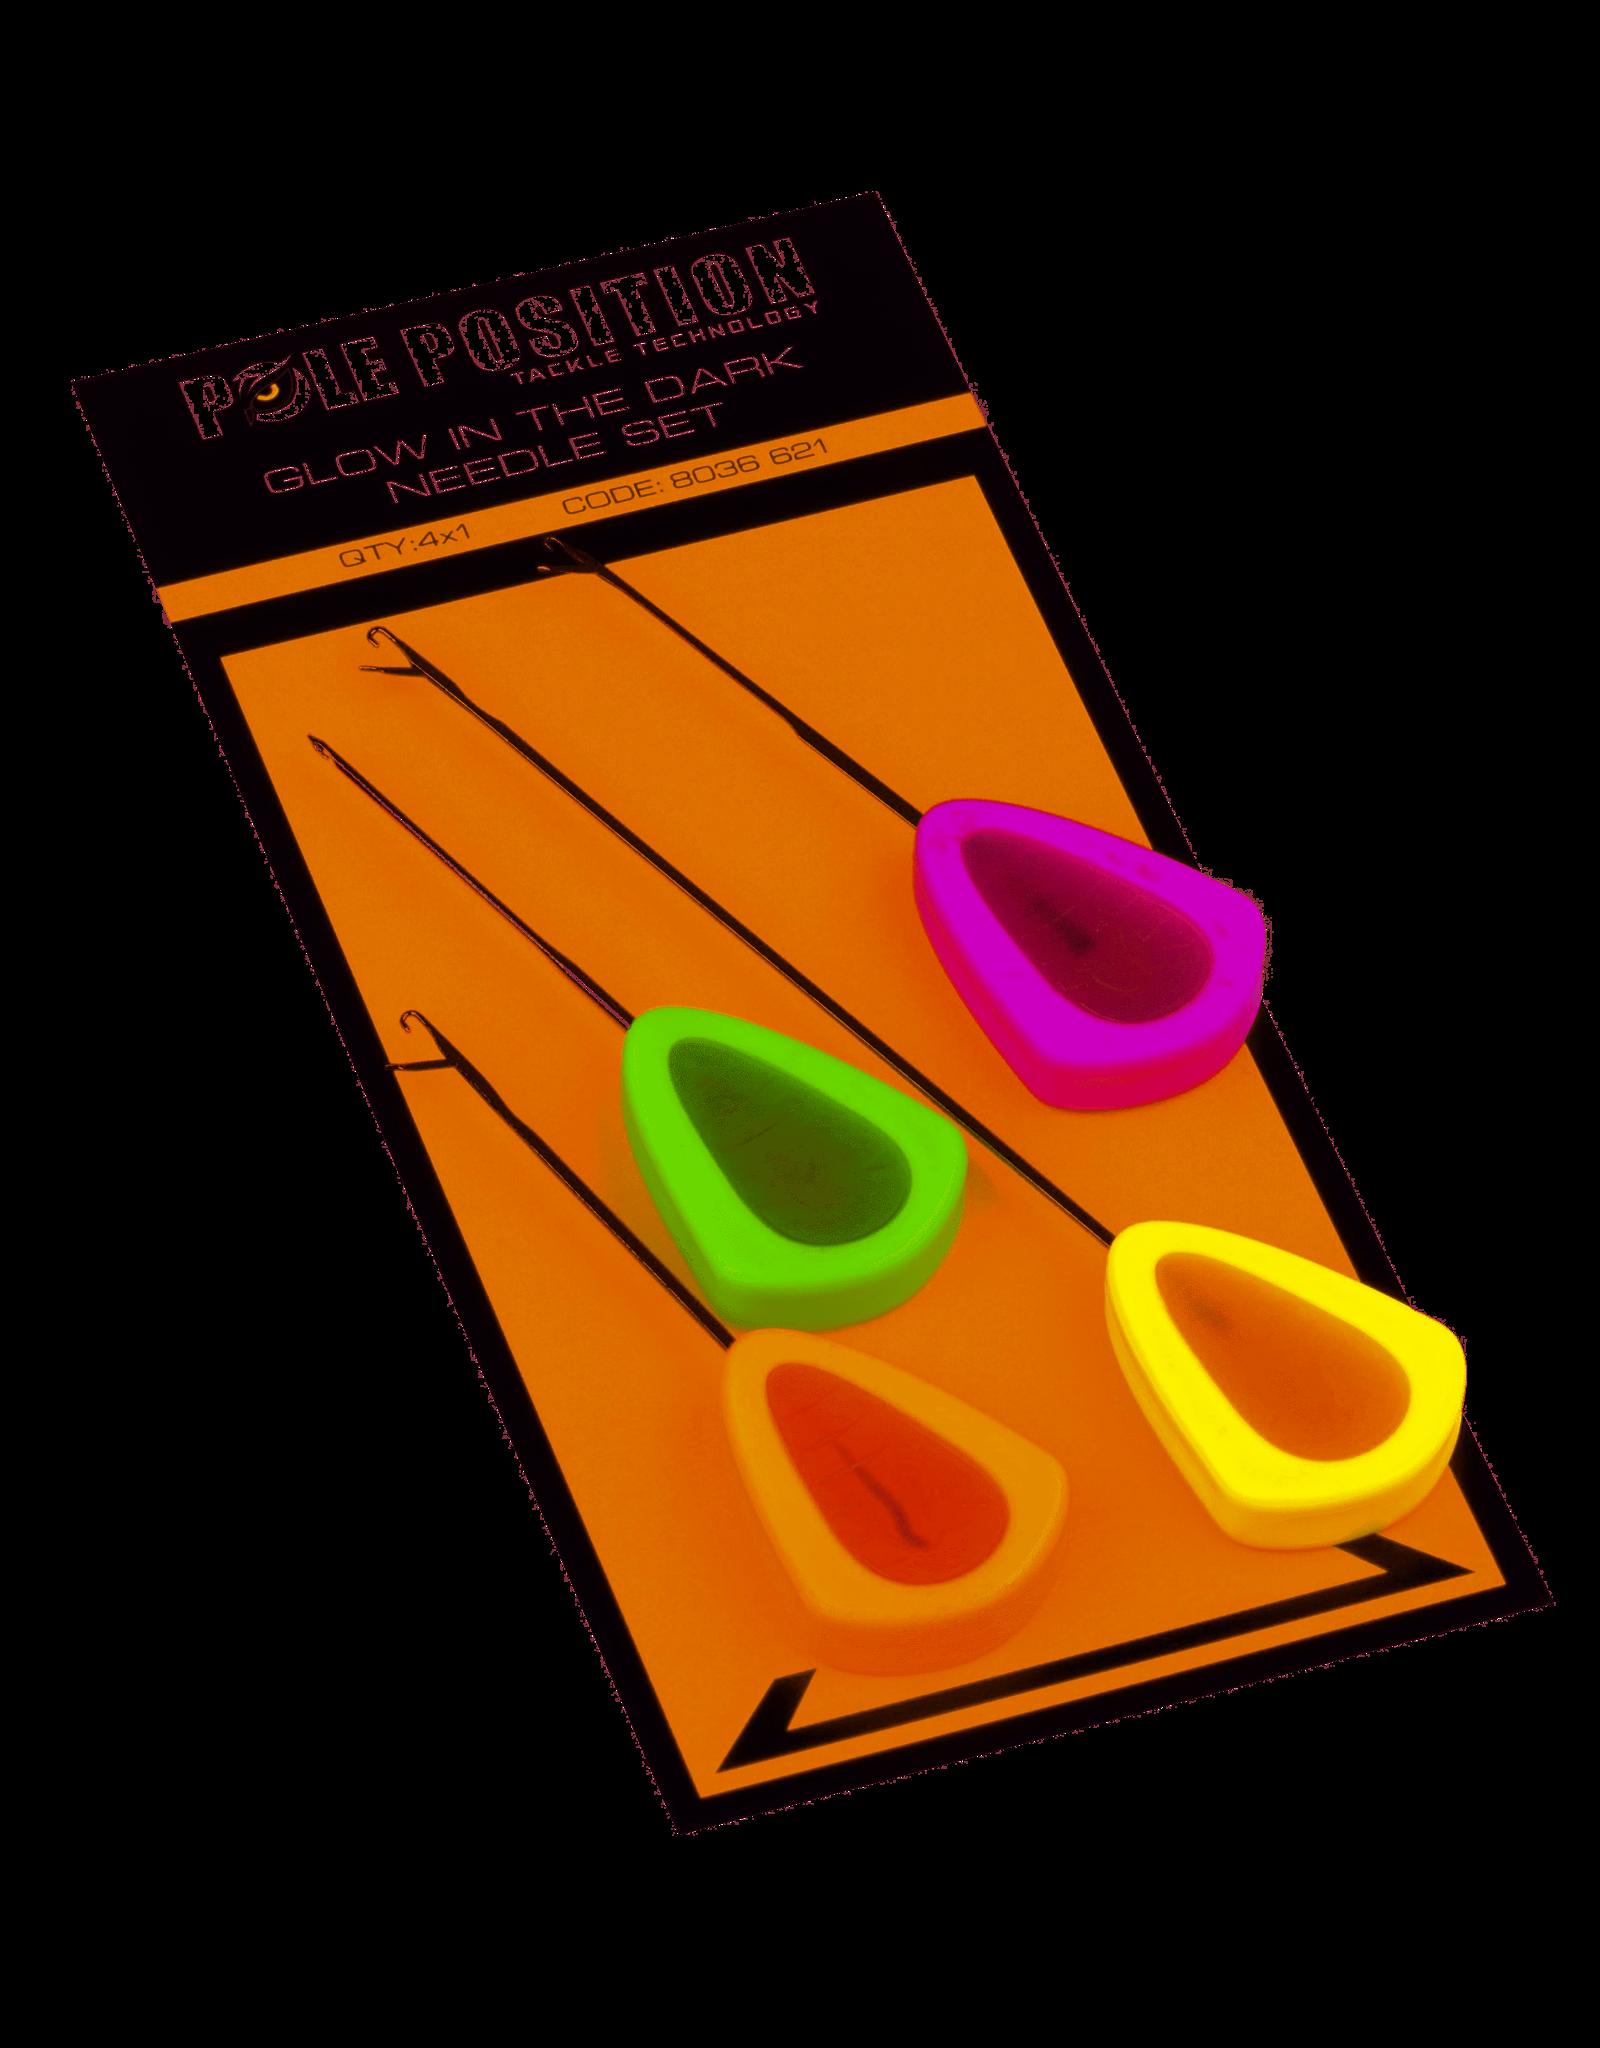 STRTG Strategy Glow in The Dark Needle Set